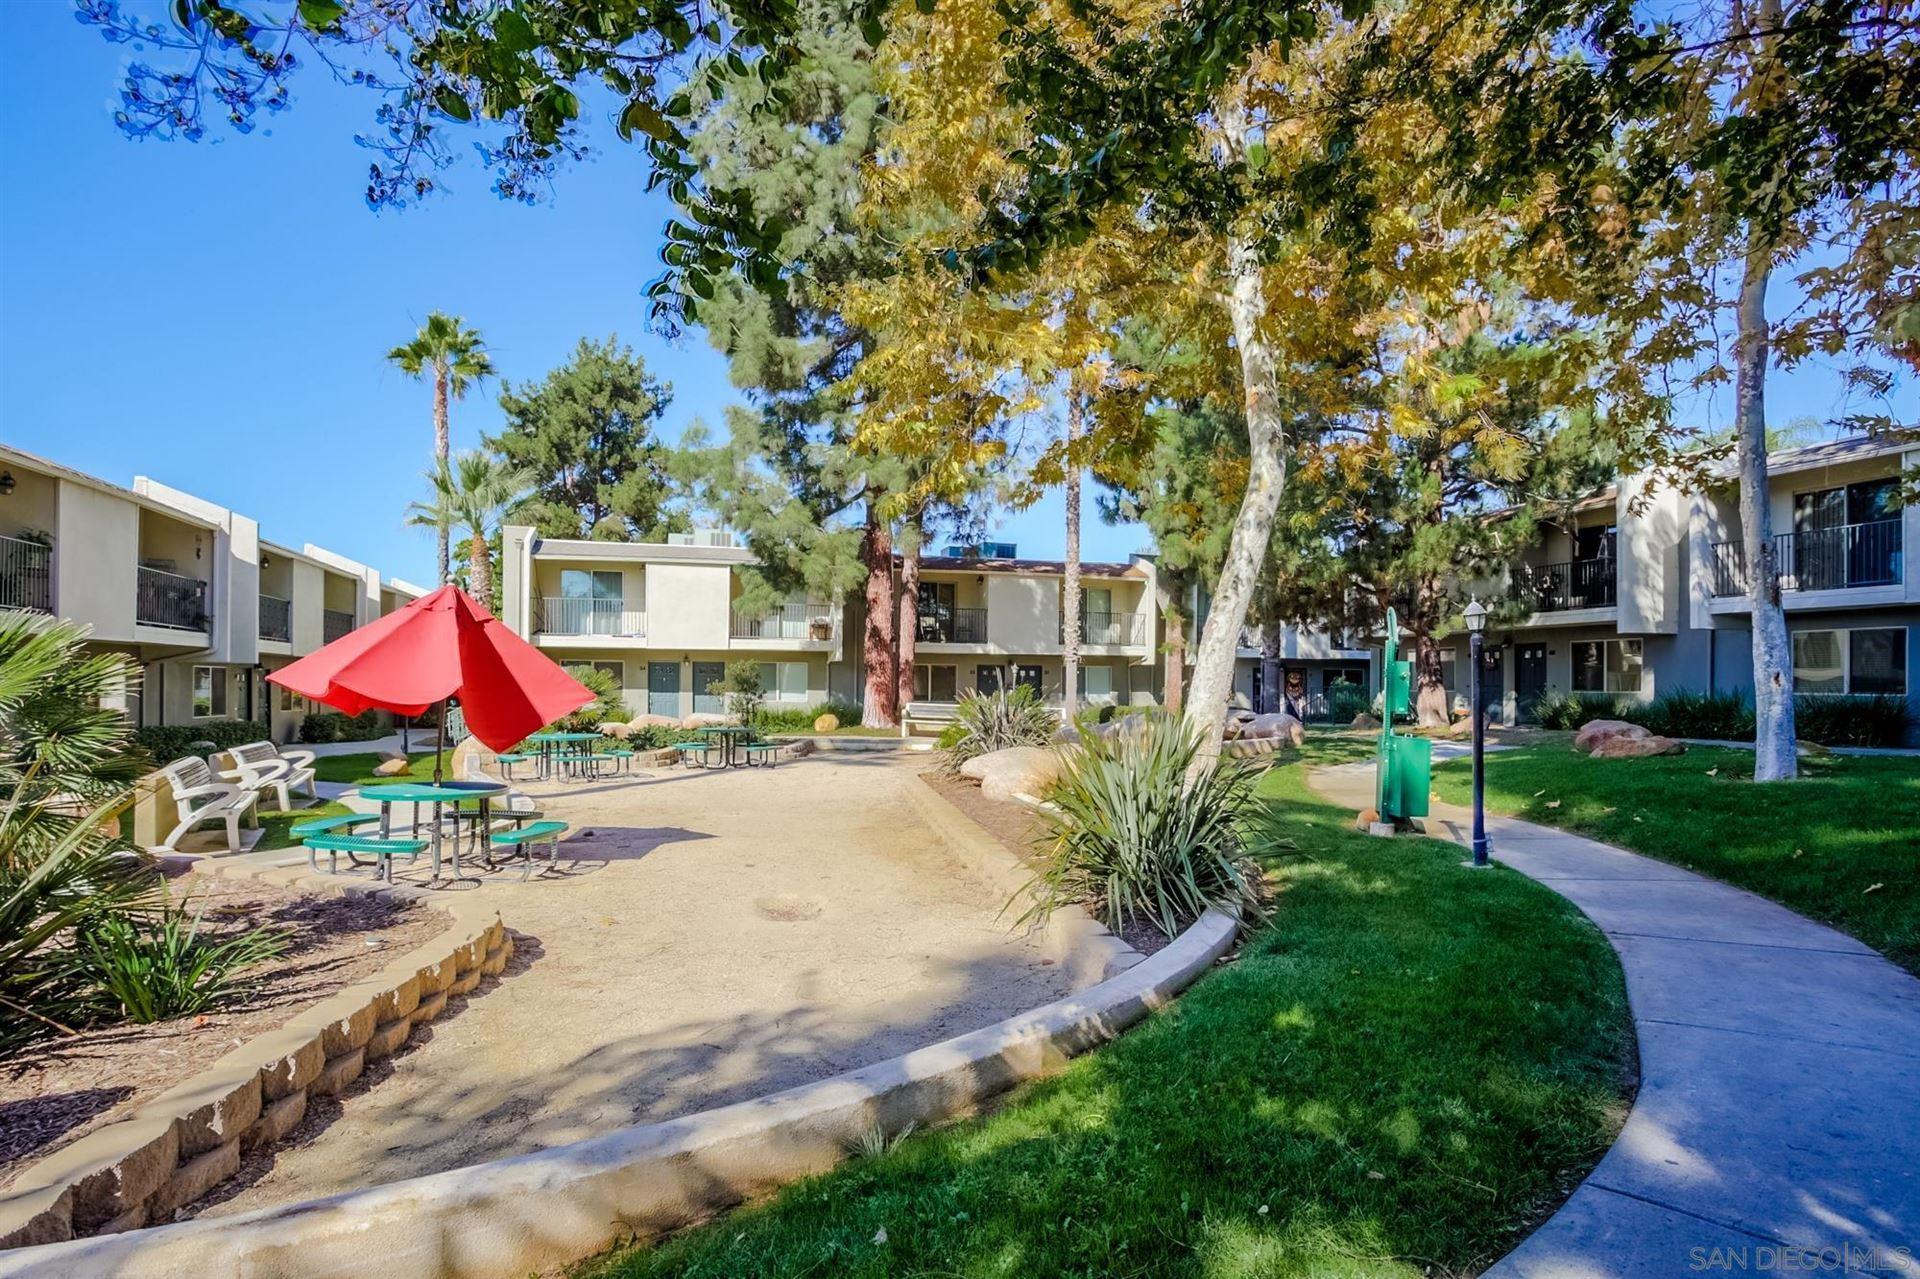 Photo of 1045 Peach Ave #69, El Cajon, CA 92021 (MLS # 210029494)